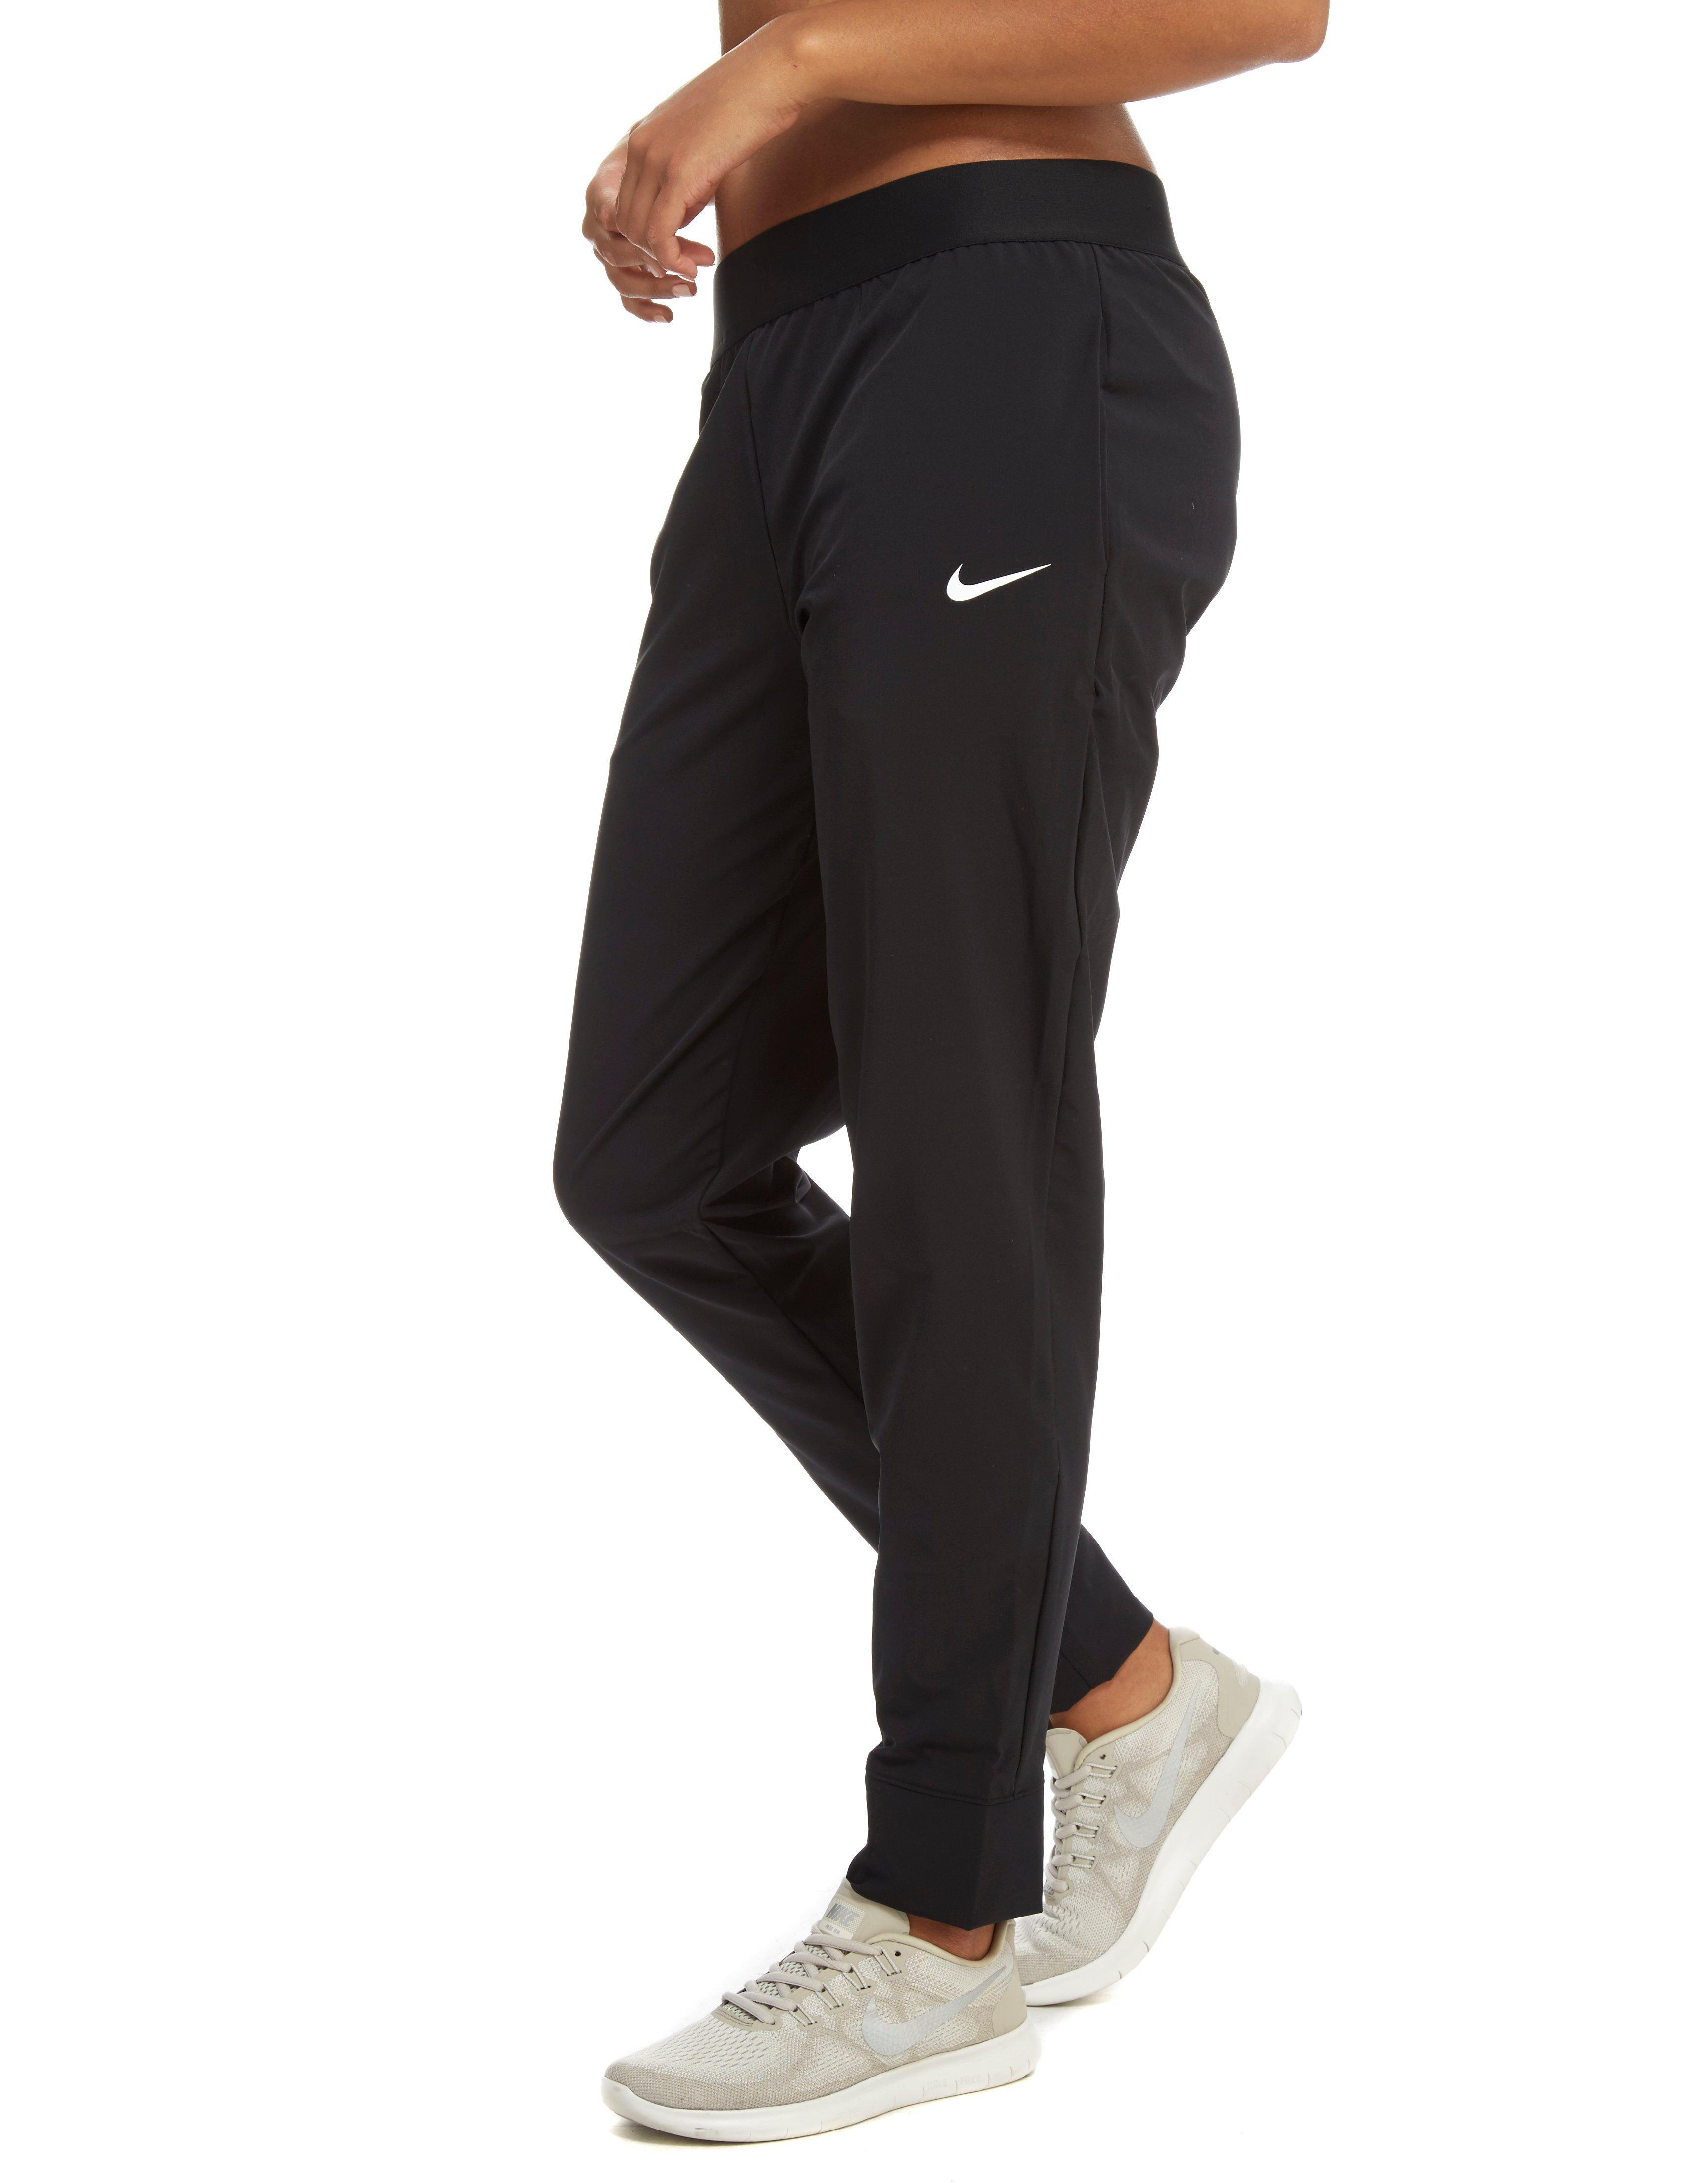 Jd Sports Nike Womens Clothing